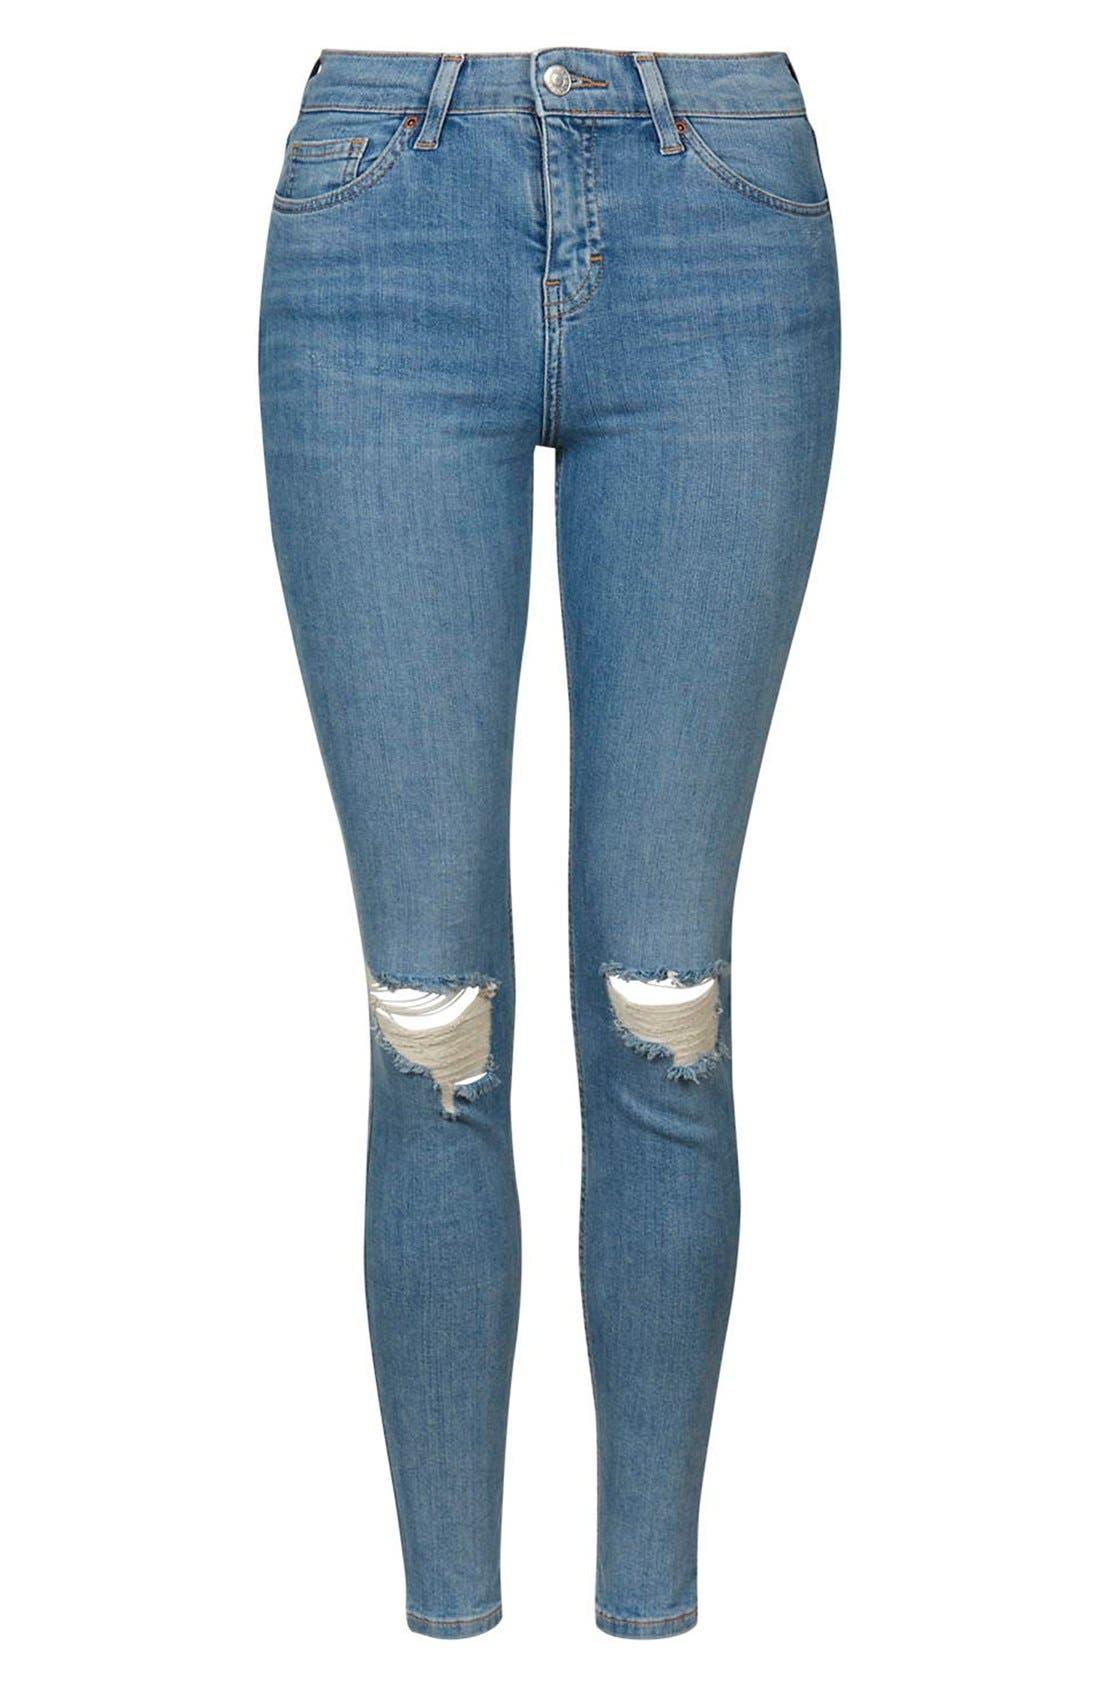 Alternate Image 4  - Topshop 'Jamie' Distressed Skinny Jeans (Petite)